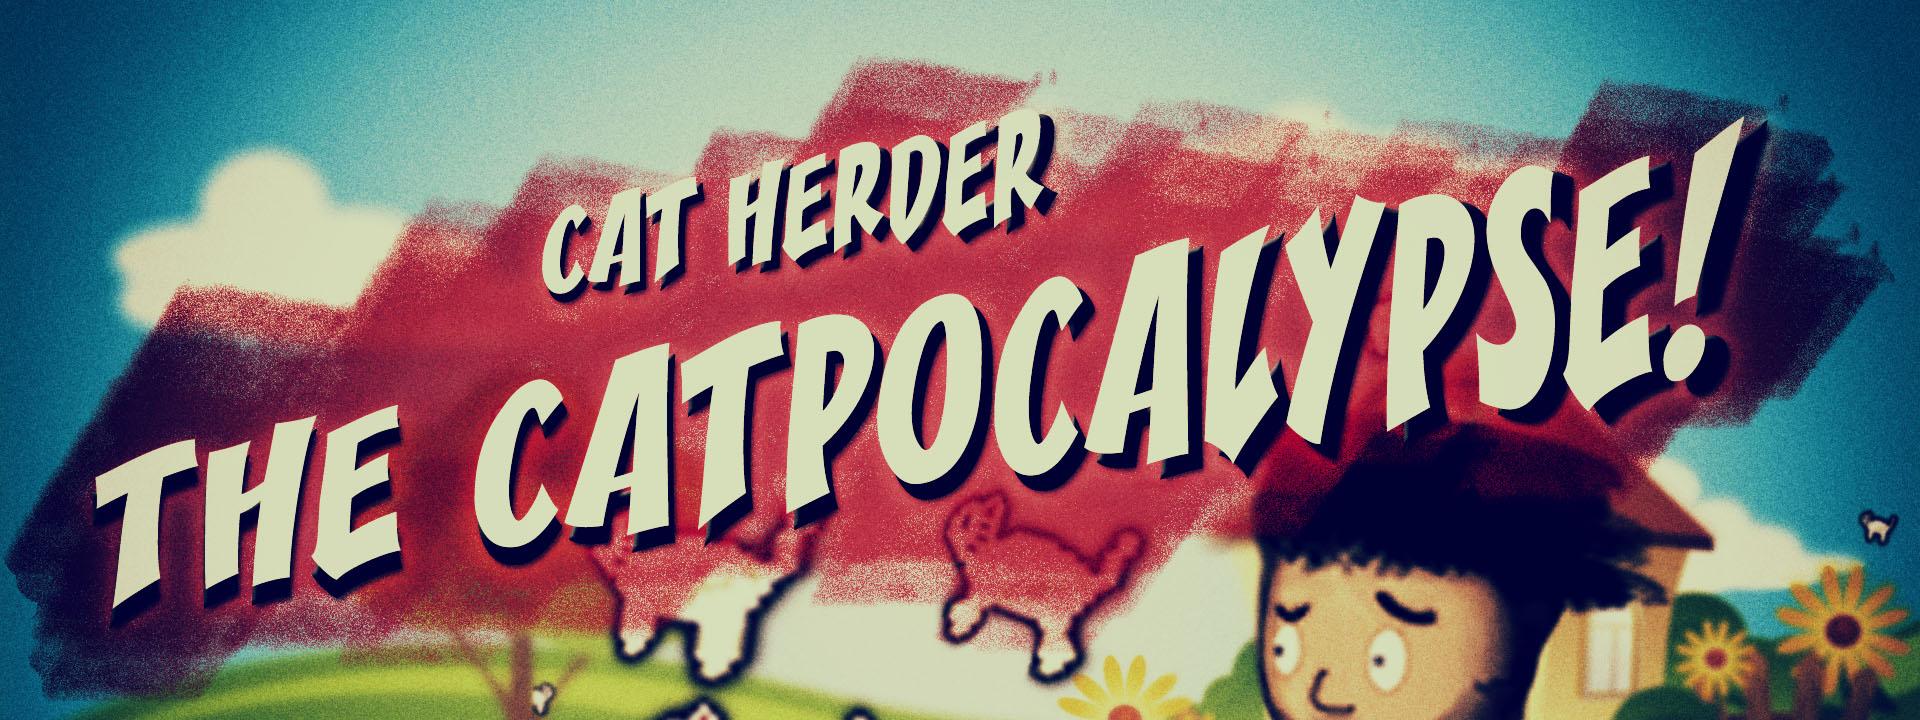 Cat Herder - THE CATPOCALYPSE